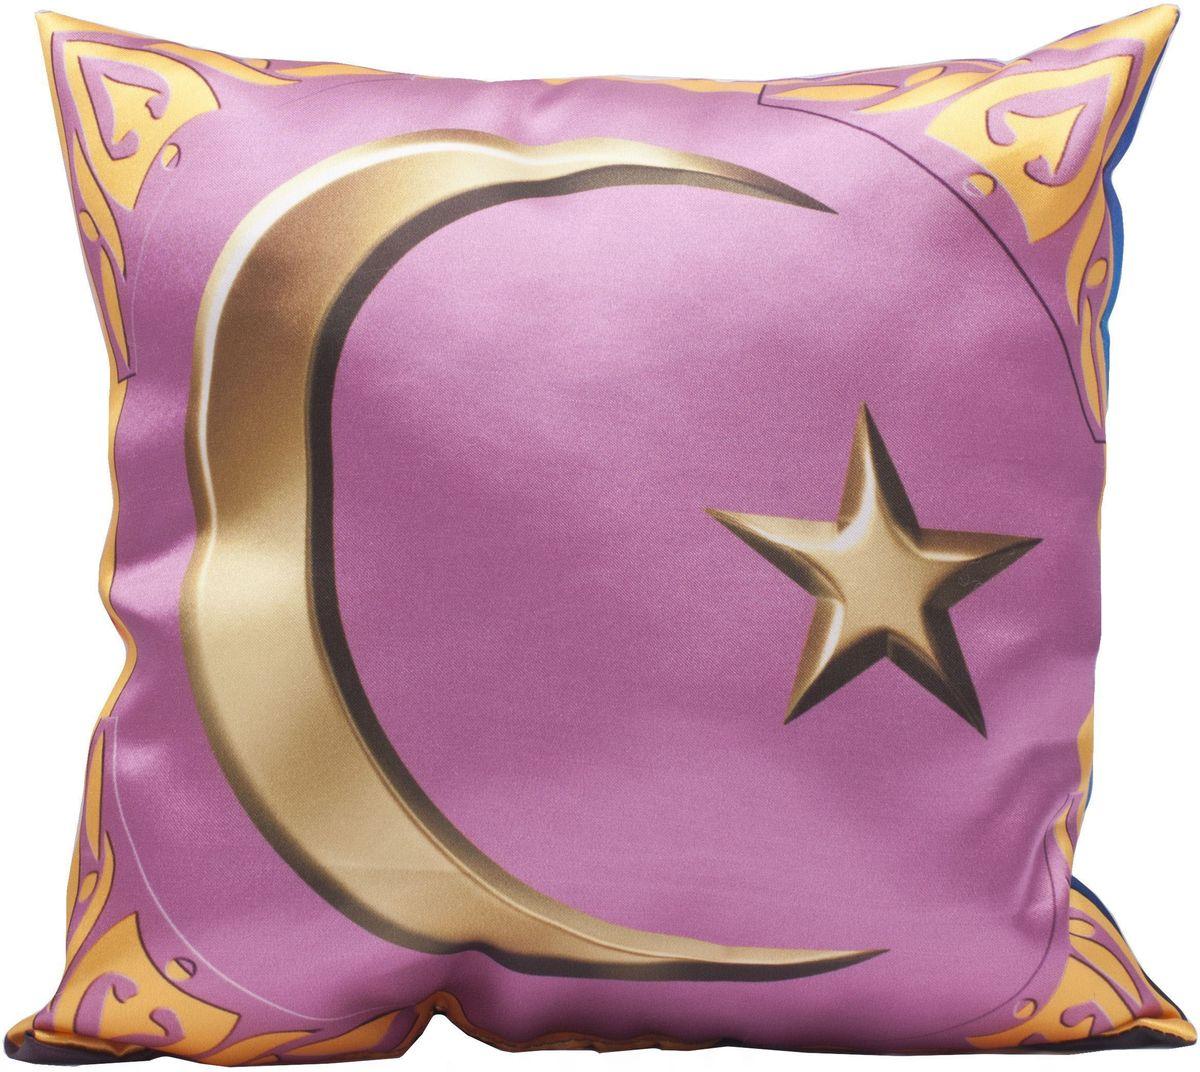 Подушка декоративная Главдор GL-529. Полумесяц с мечетью, с рисунком, 30х30 см подушки декоративные рюшаль подушка